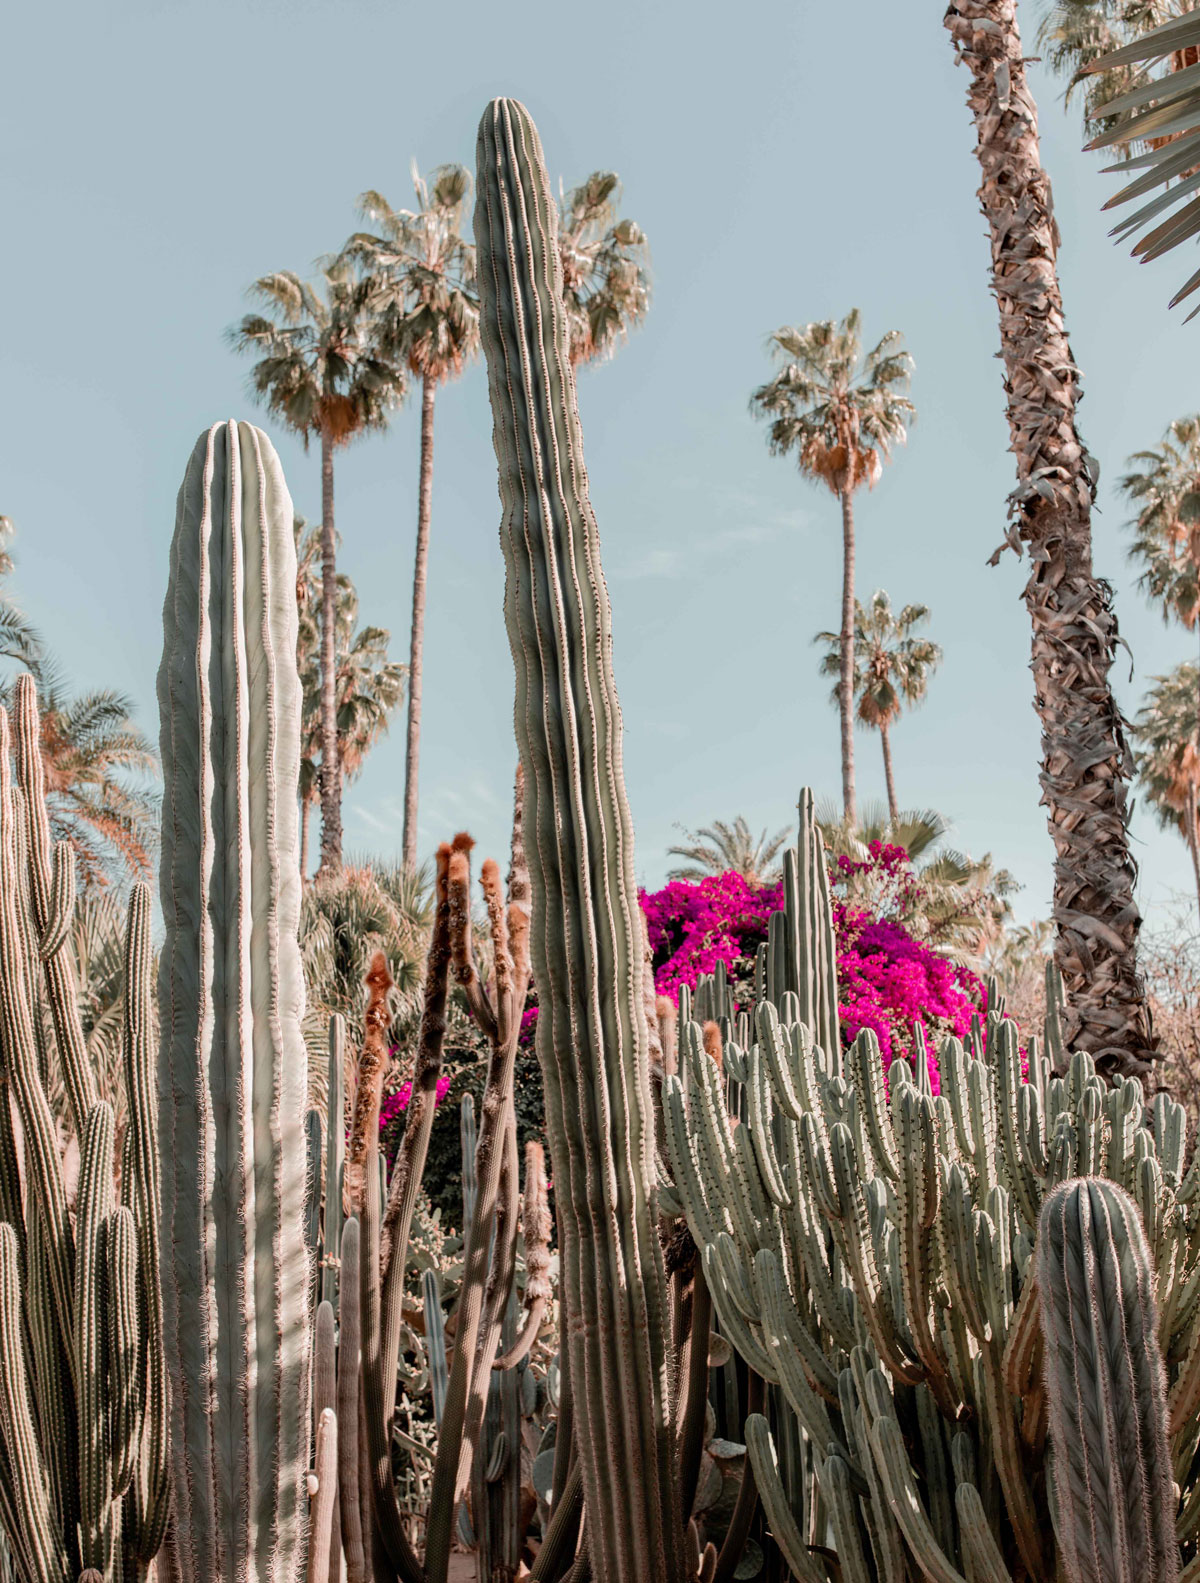 2-Top-things-to-do-in-marrakech-Bucket-list-kelseyinlondon-Kelsey-Heinrichs--What-to-do-in-marrakech--Where-to-go-in-marrakech-top-places-in-marrakech-le-jardin-majorelle